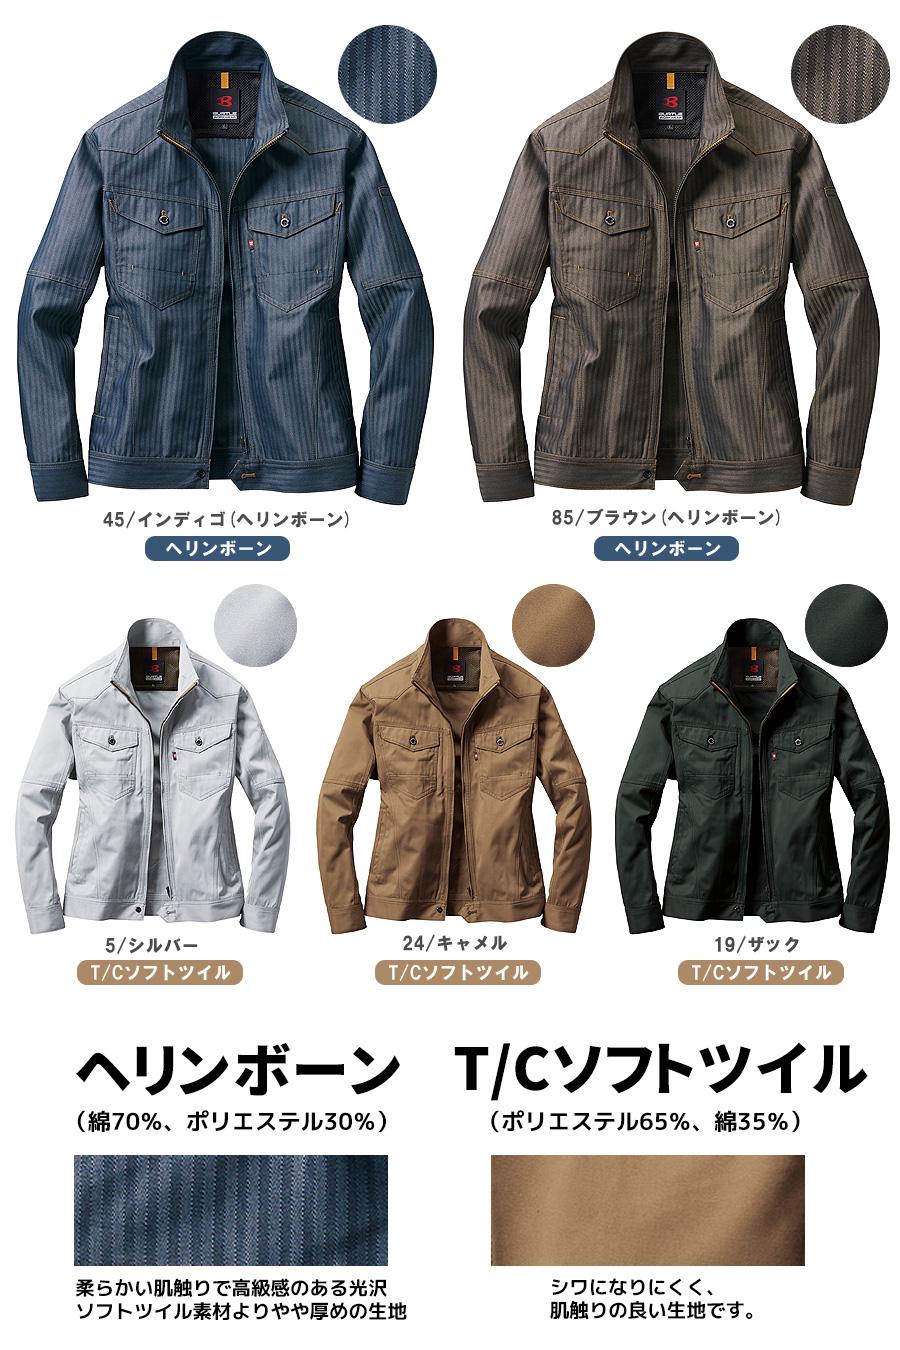 【BURTLEバートル】ジャケット(WEB限定特価)